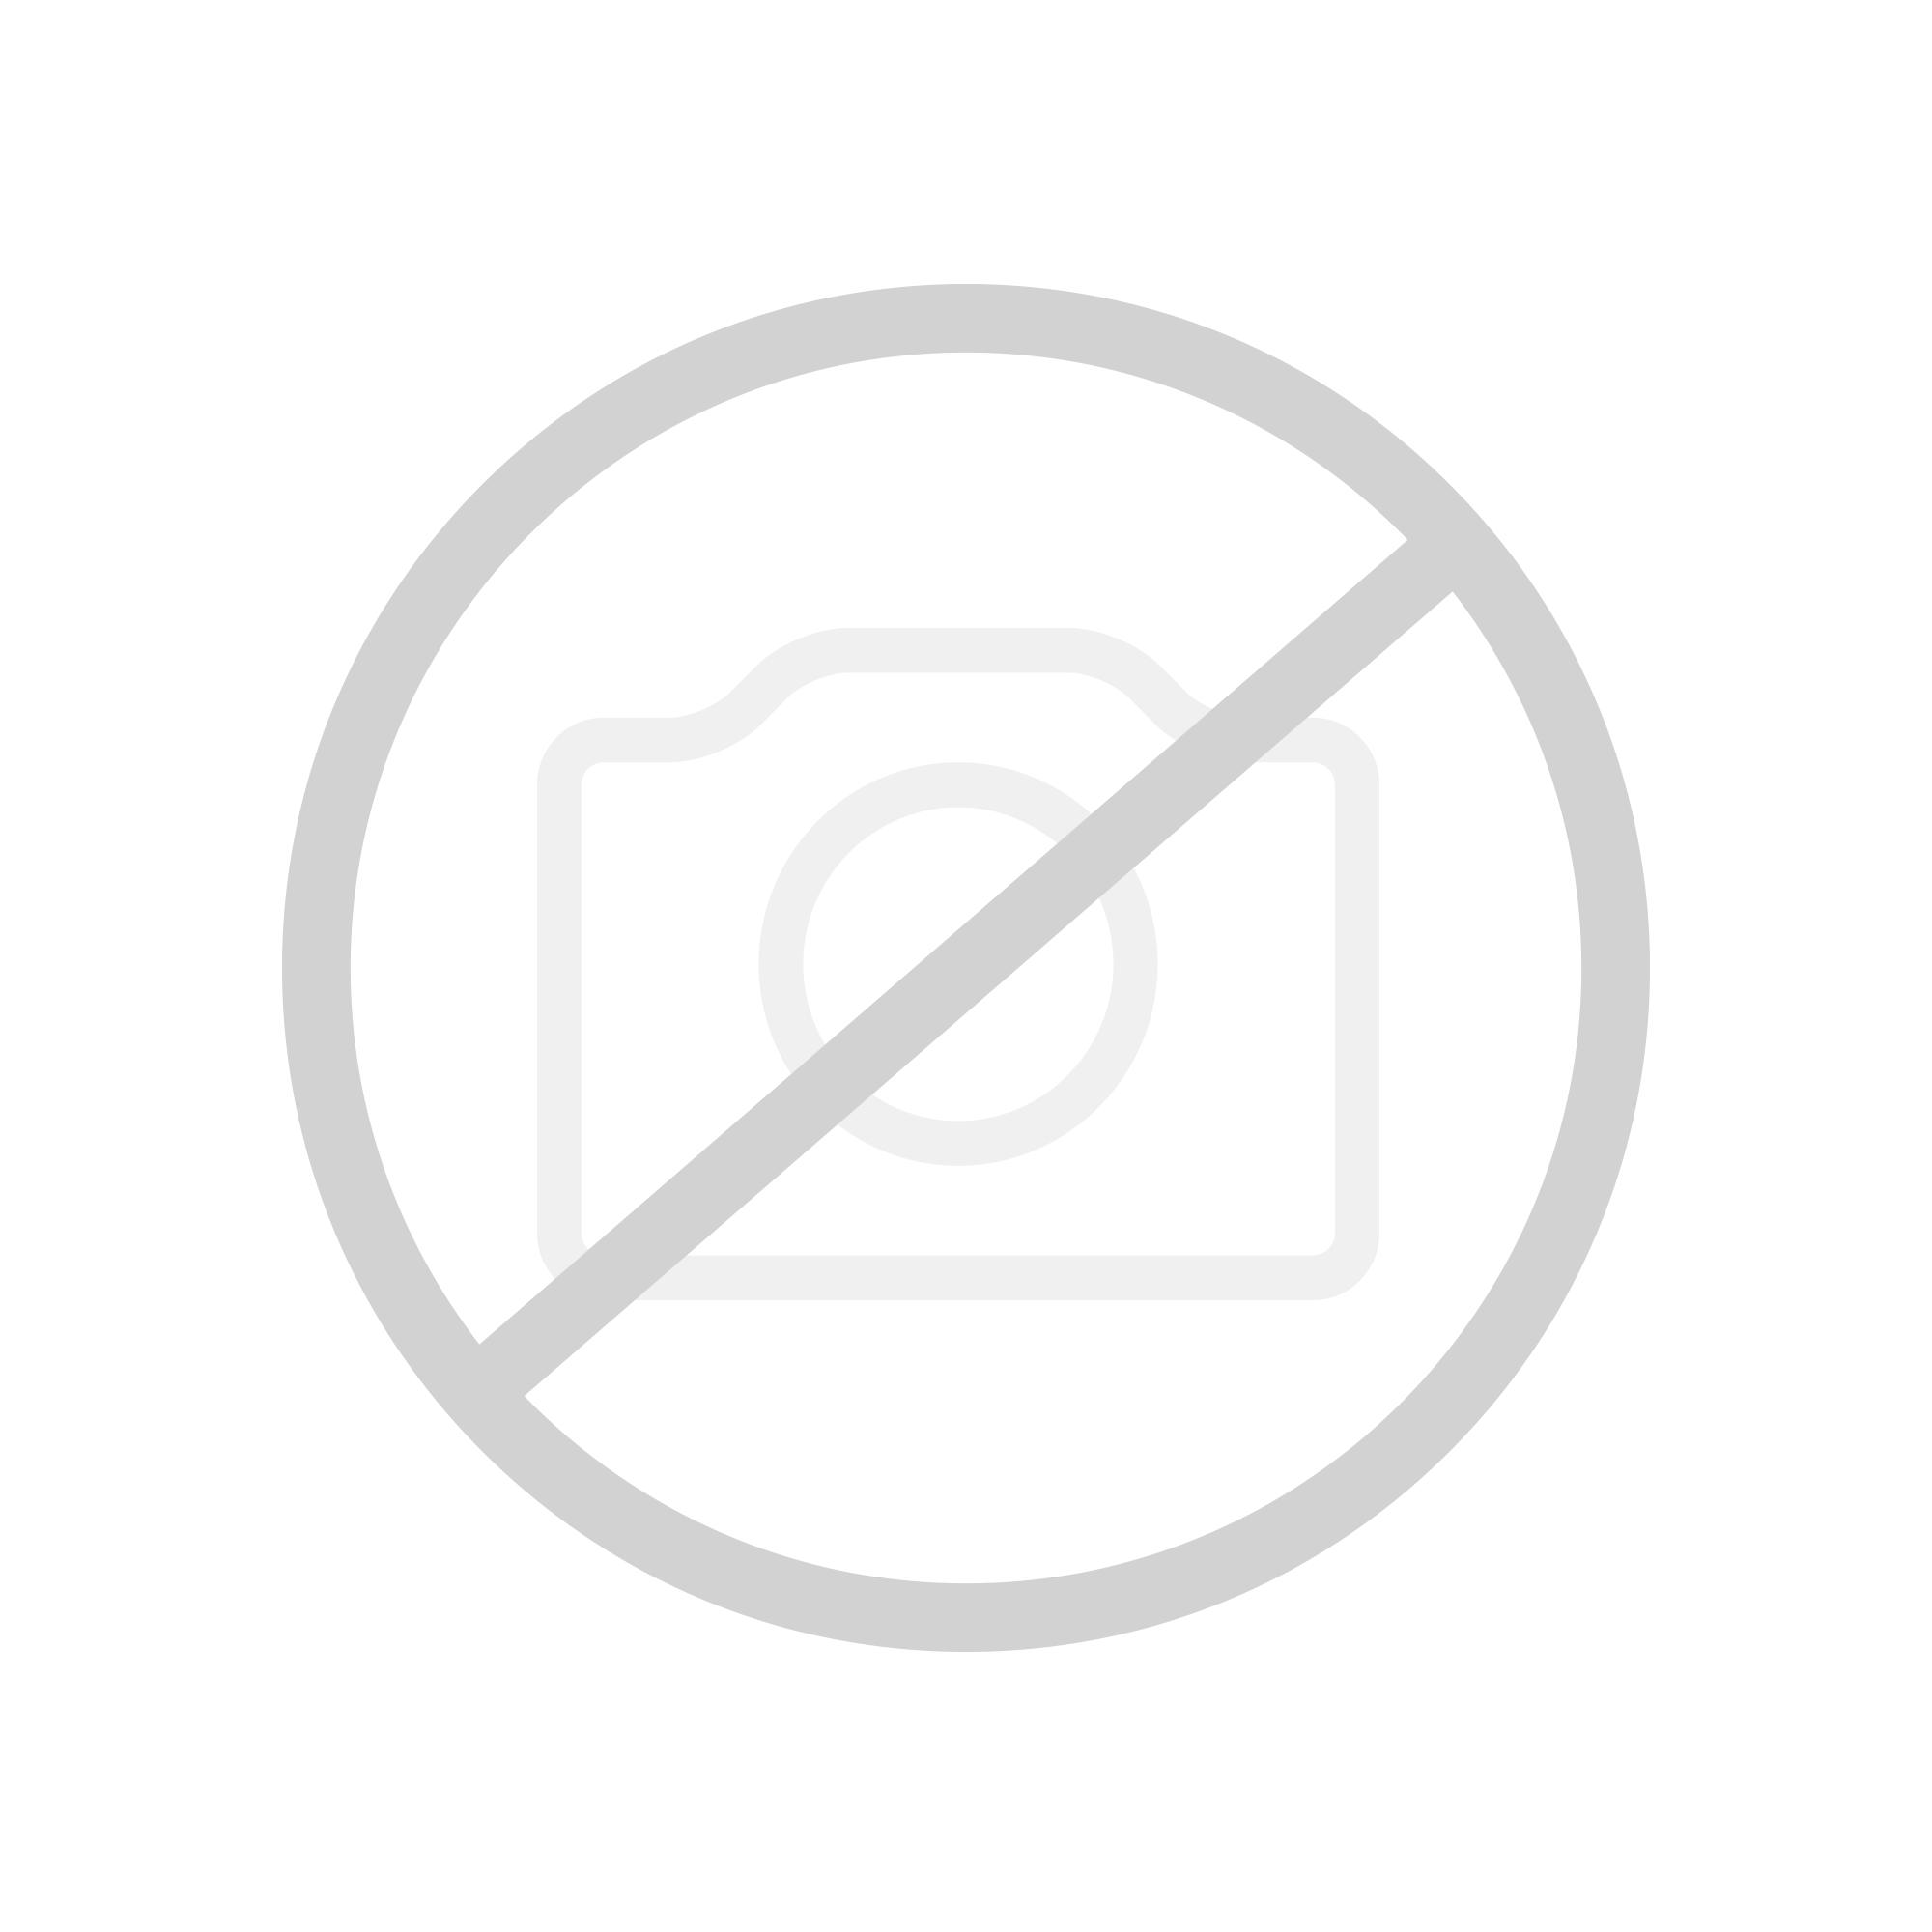 hansgrohe axor uno einzelhaken 41537000 reuter onlineshop. Black Bedroom Furniture Sets. Home Design Ideas